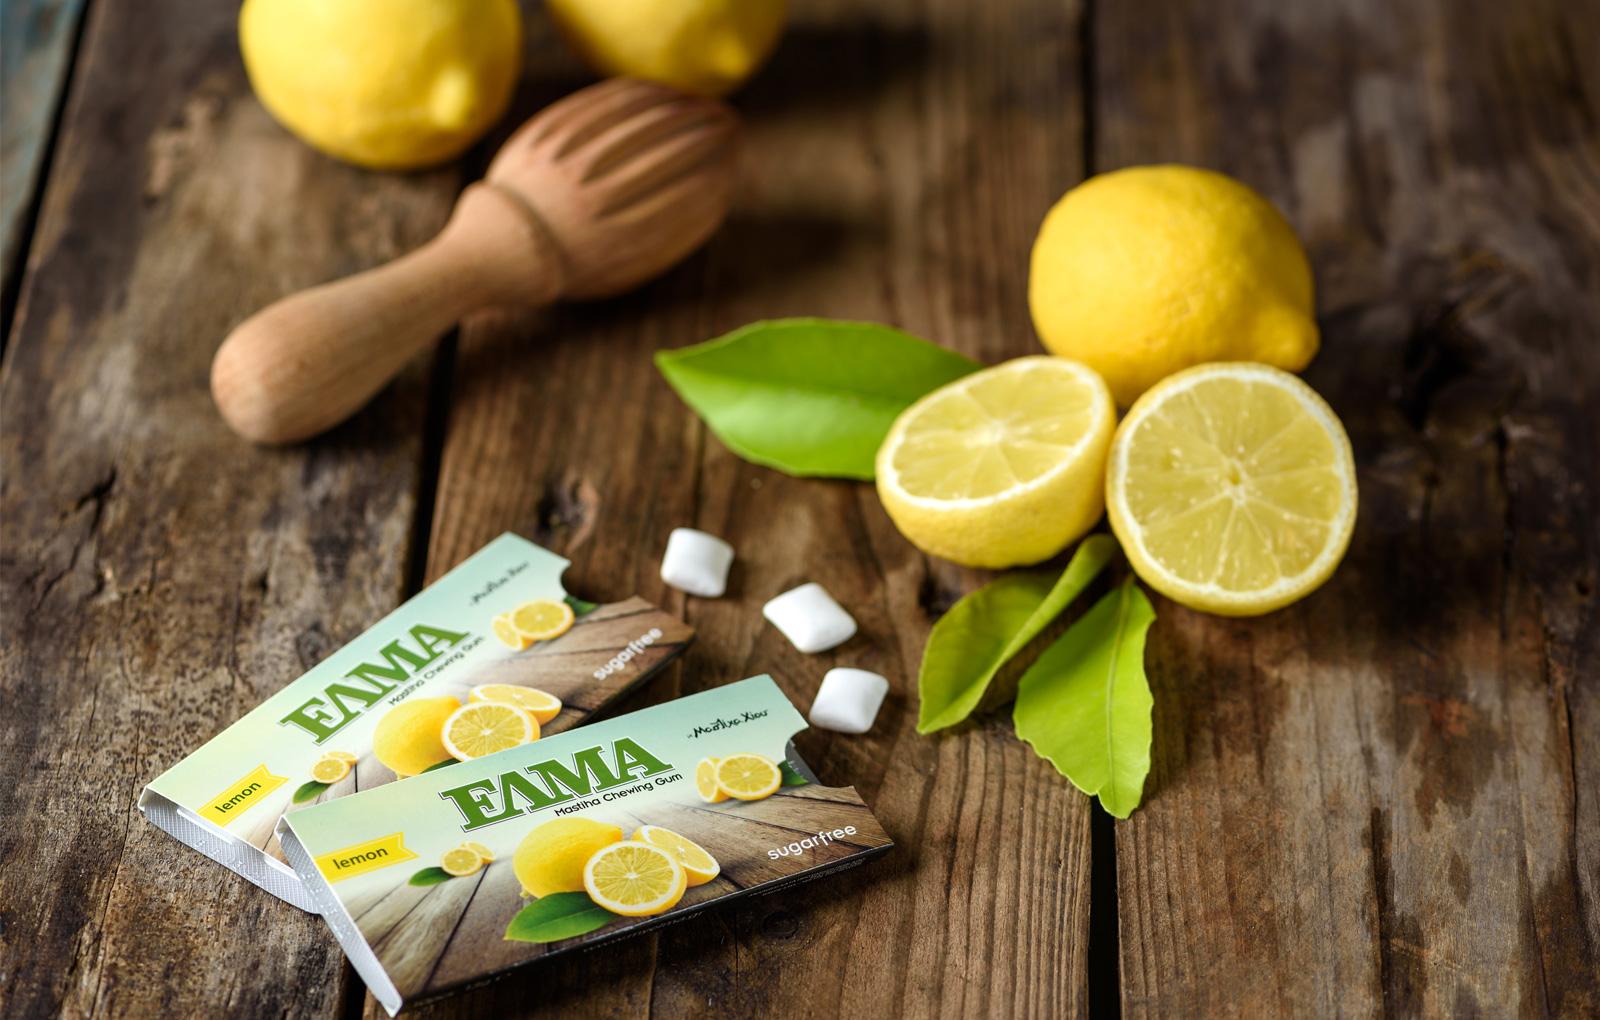 ELMA Tsixles Lemoni